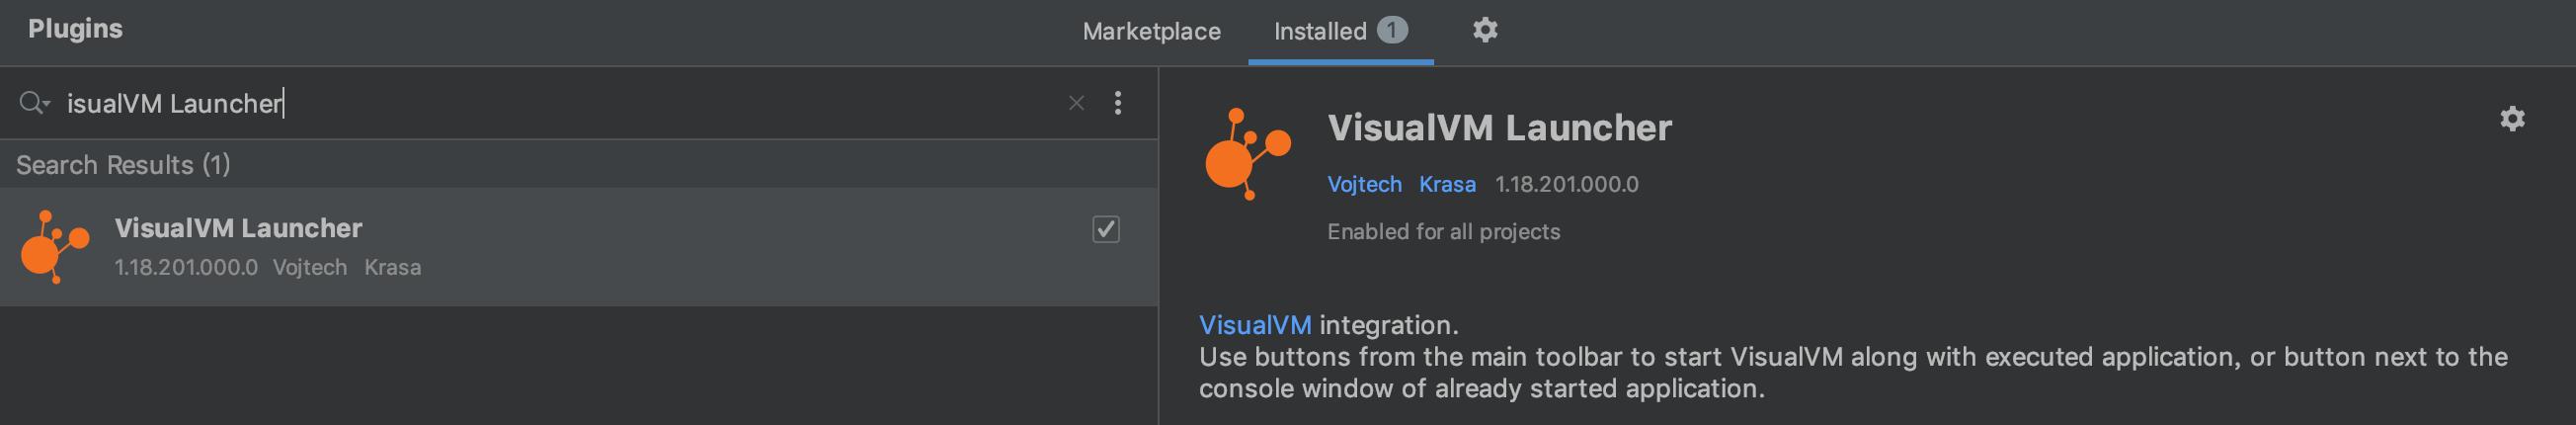 VisualVM Launcher